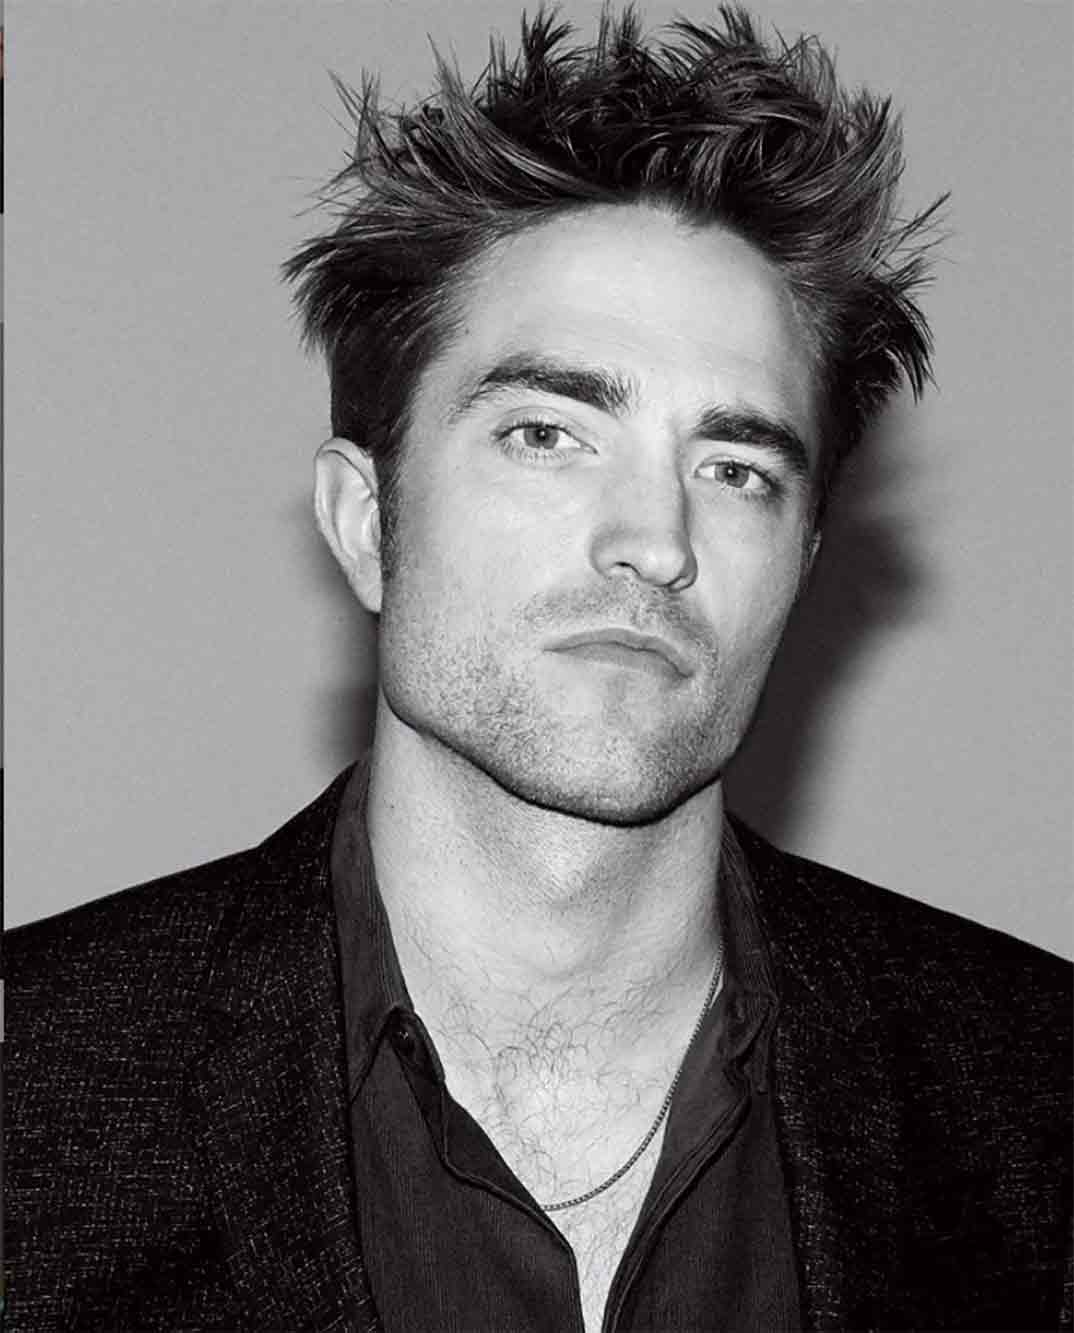 Robert Pattinson © Redes Sociales